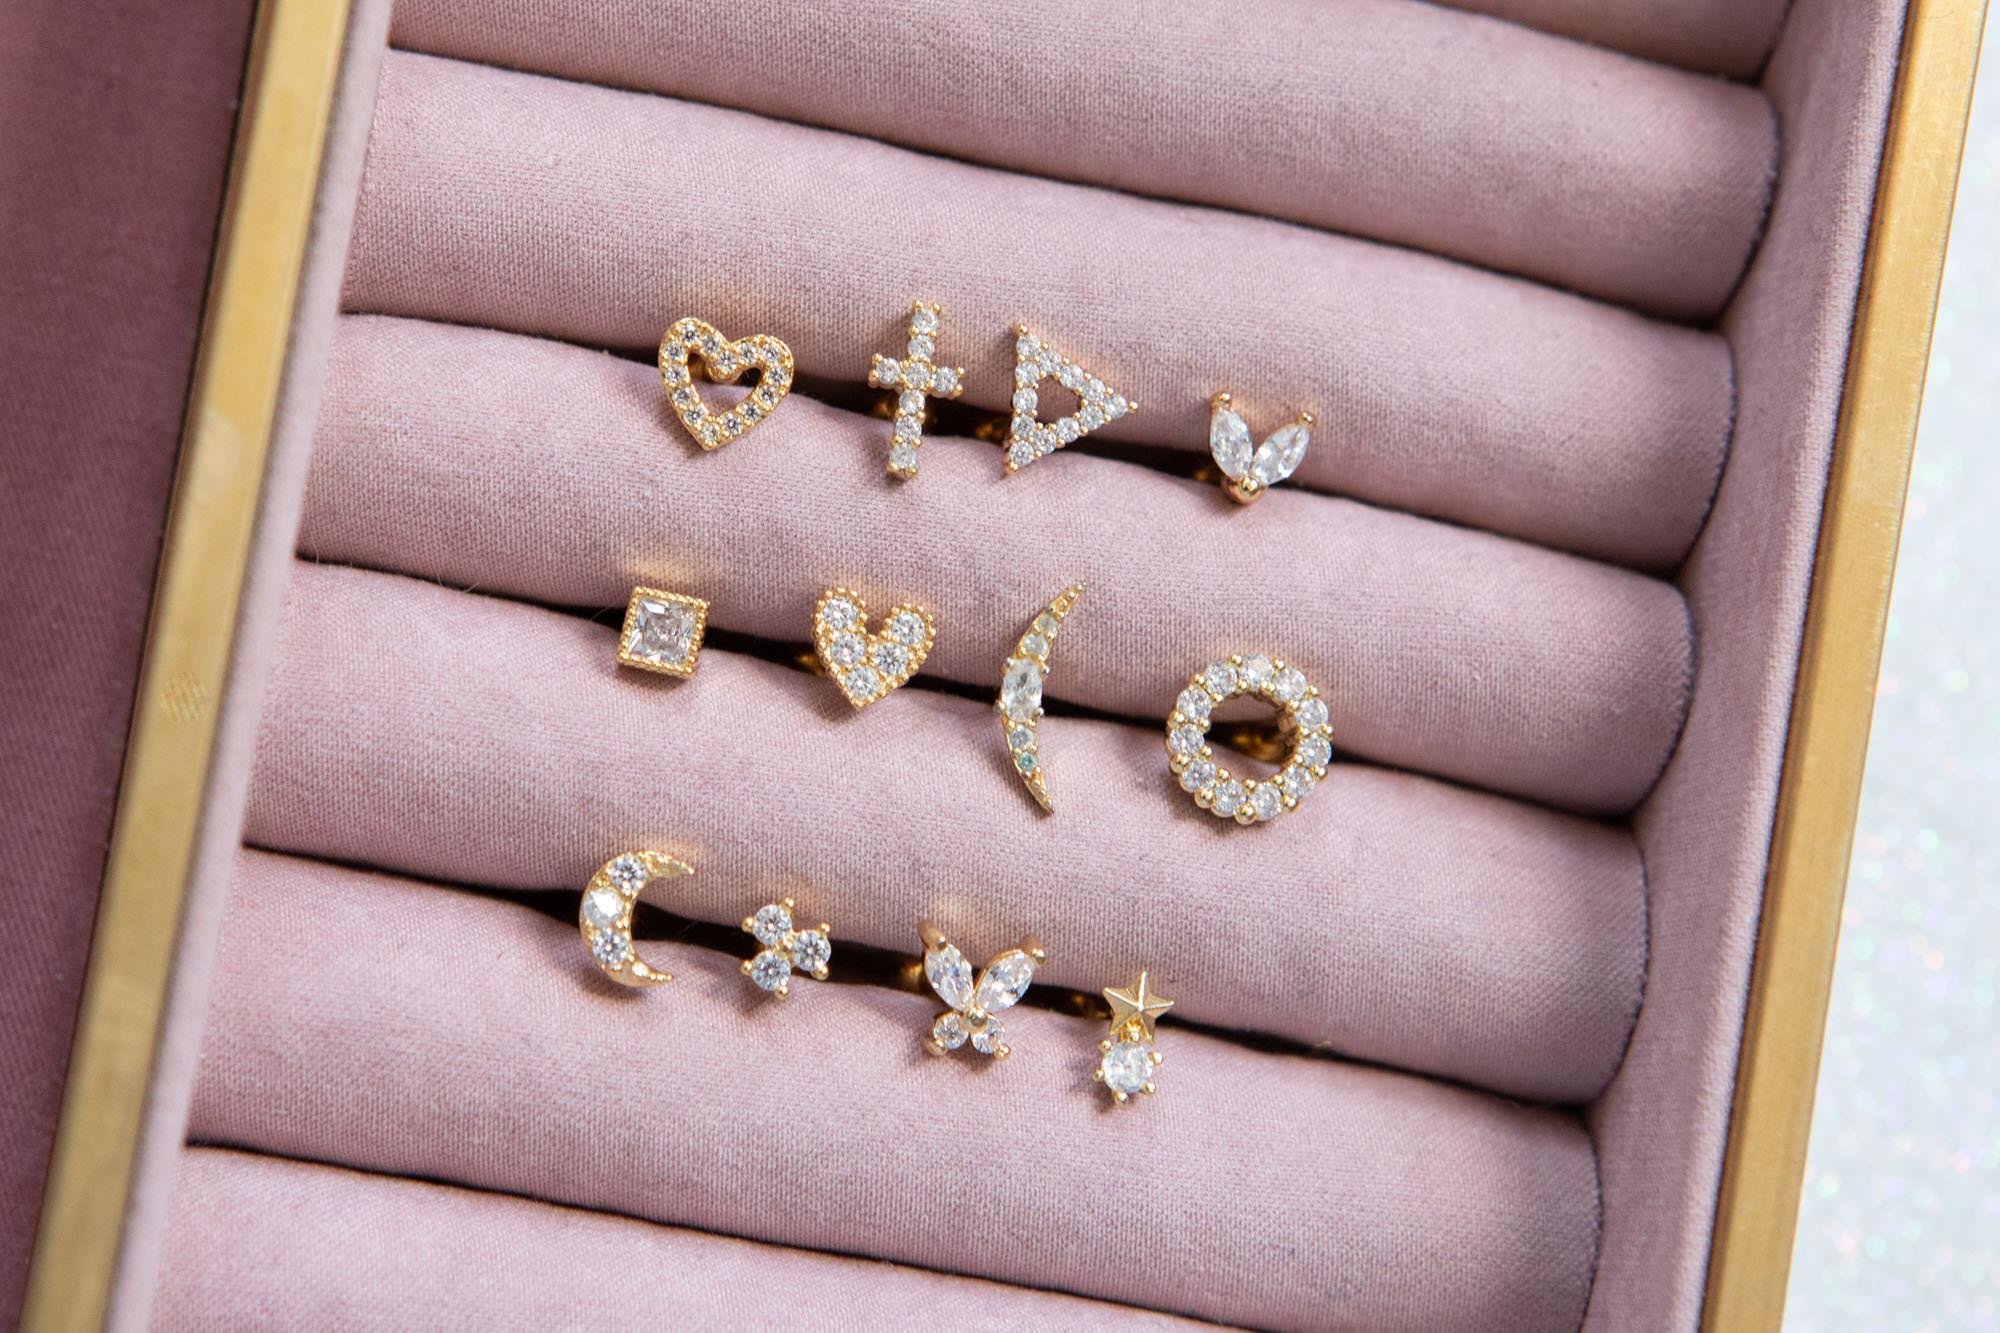 barbell design, birdesmaid jewellery, bridal accessories, bridal earrings, bridesmaid gifts, contempary jewellery, ear cuffs, helix, huggie hoops, labreyt design, lip rings, lobe earrings, modern jewellery, nose rings, stackable earrings, stacked earrings, statement jewellery, tragus, twilight london, bridal earrings, bridal jewellery